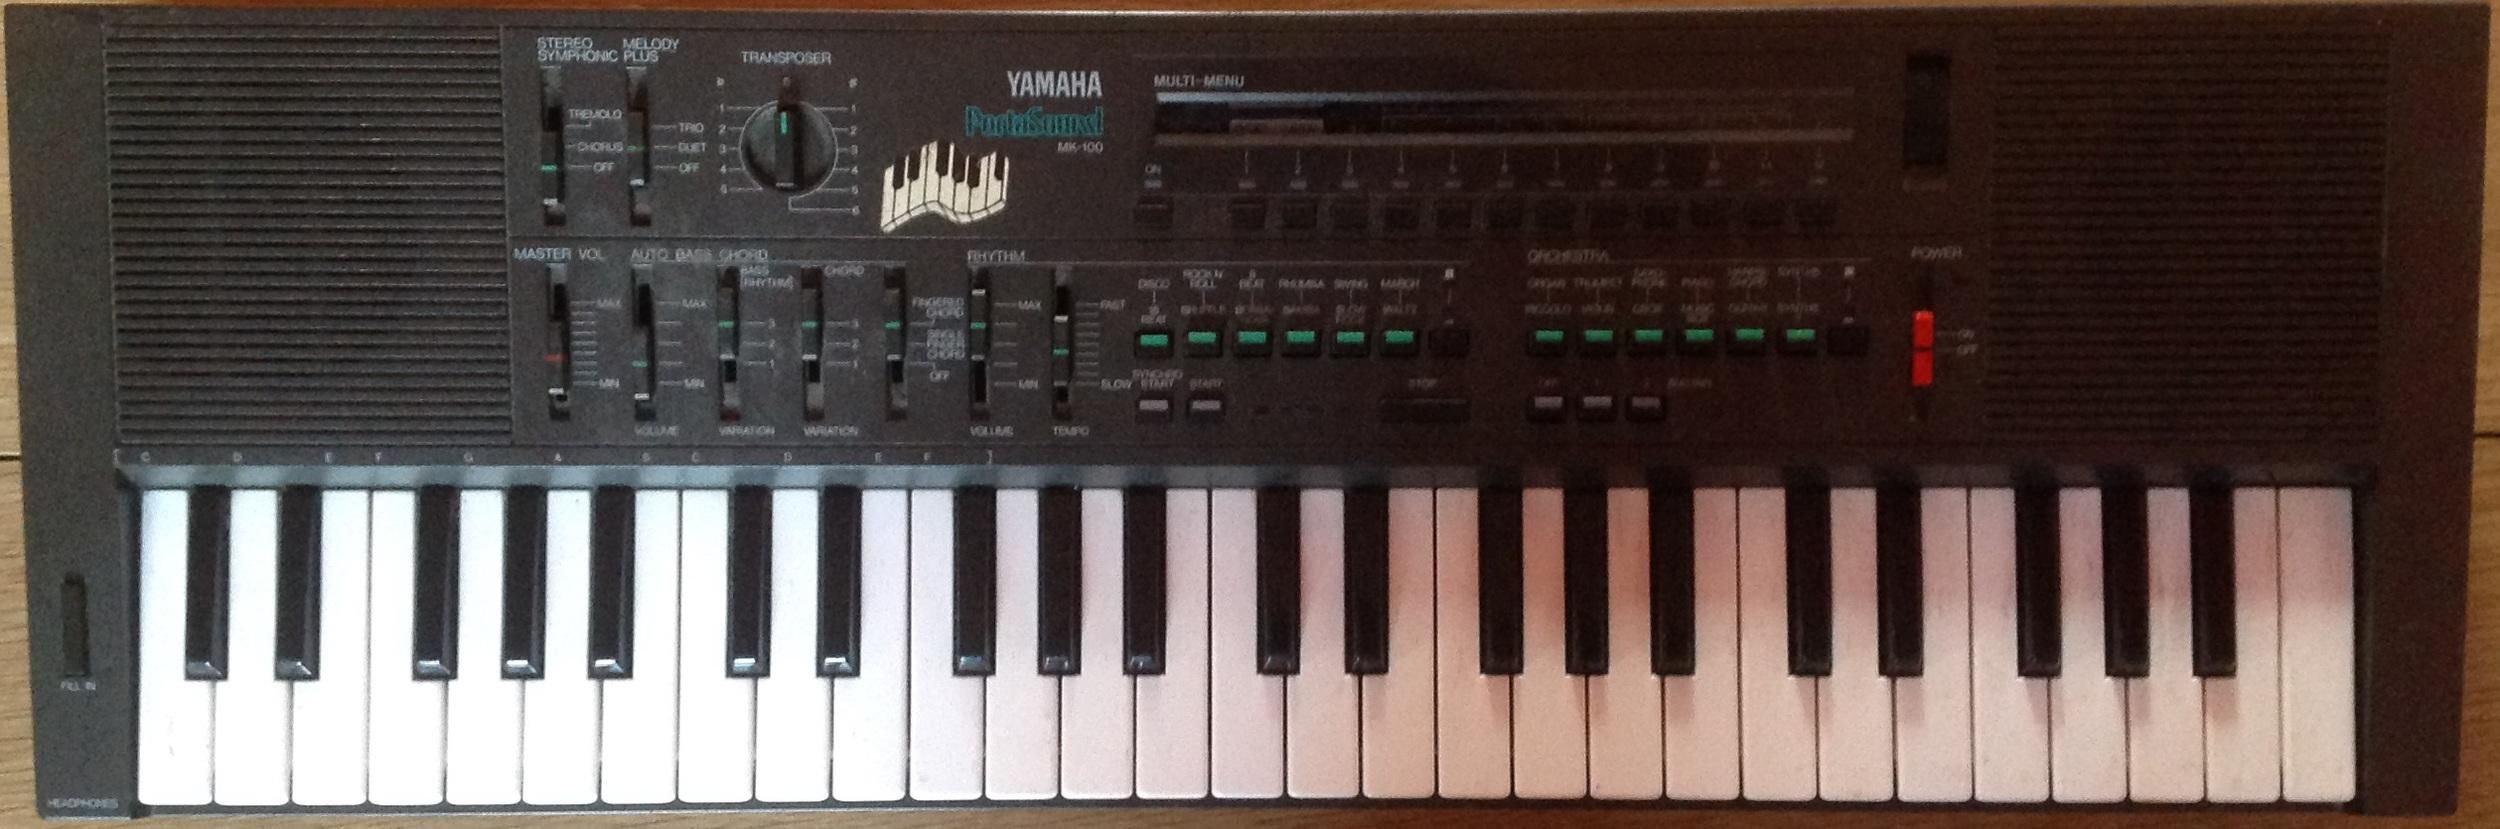 Free Kontakt Library: Yamaha Portasound MK-100 (1983